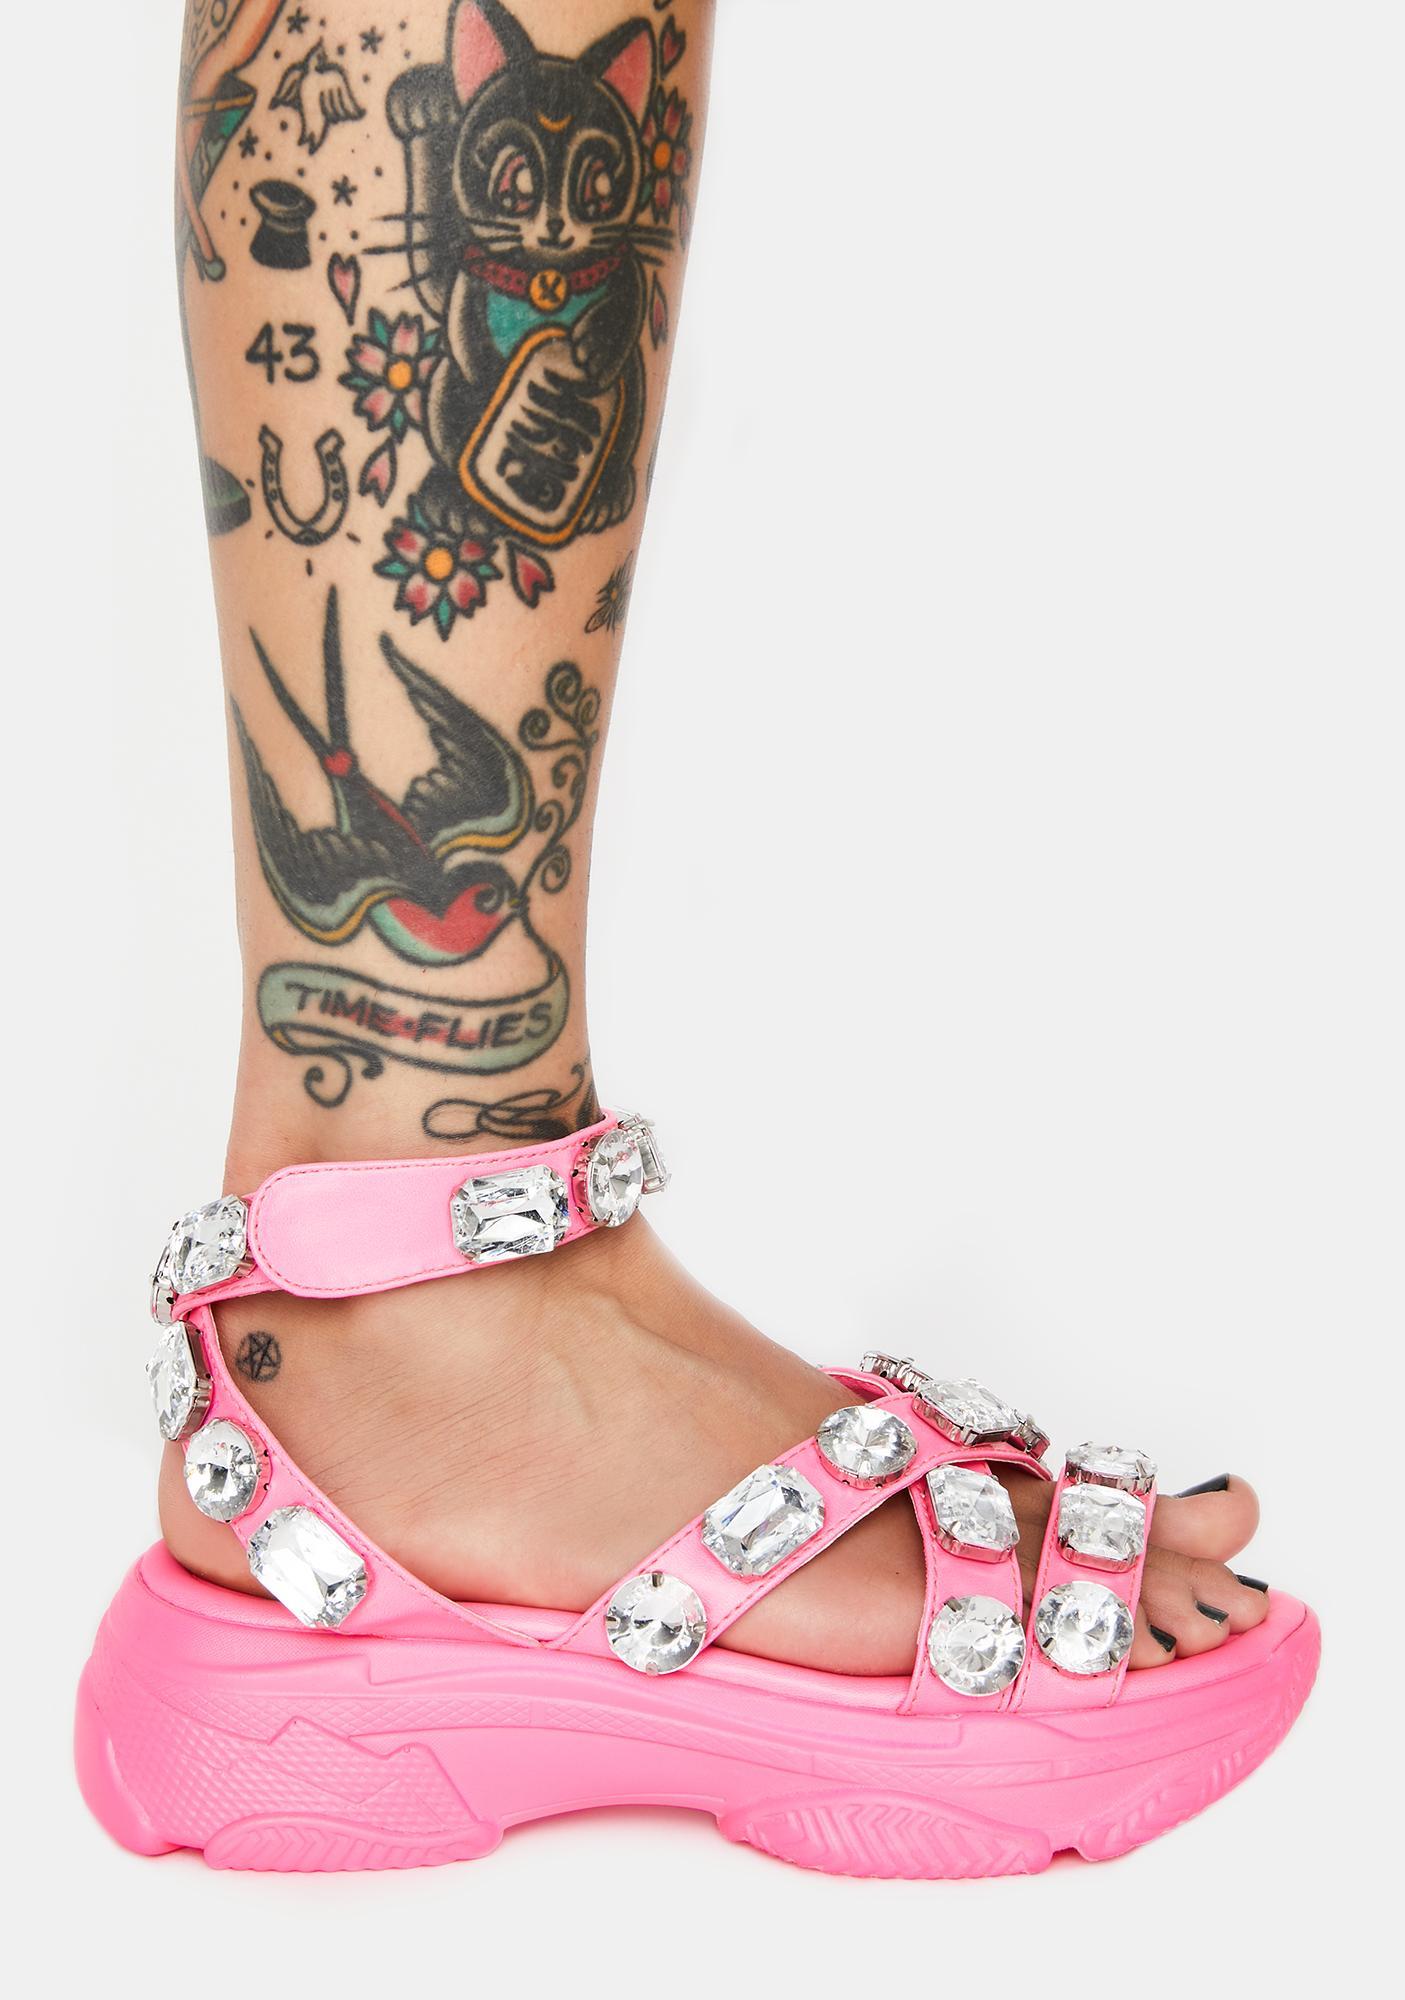 Sugar Sparklin' Strut Platform Sandals